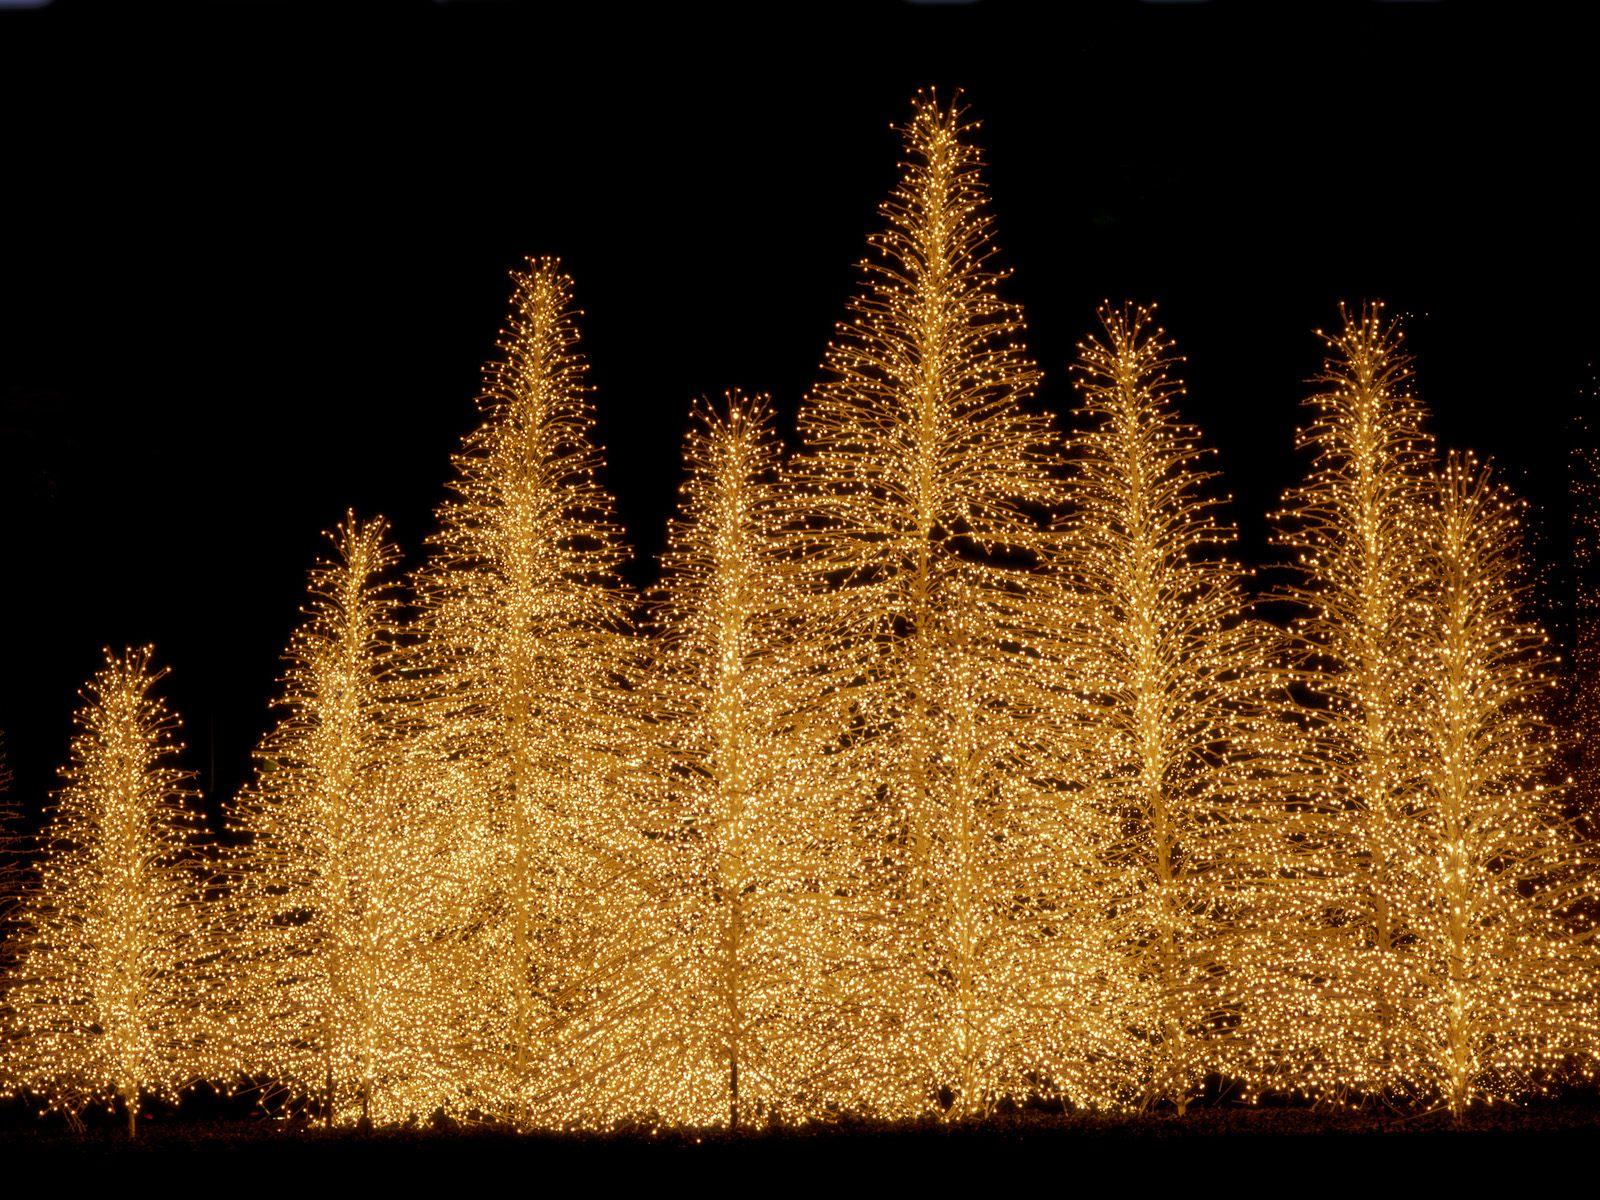 Christmas Lights Wallpaper Hd